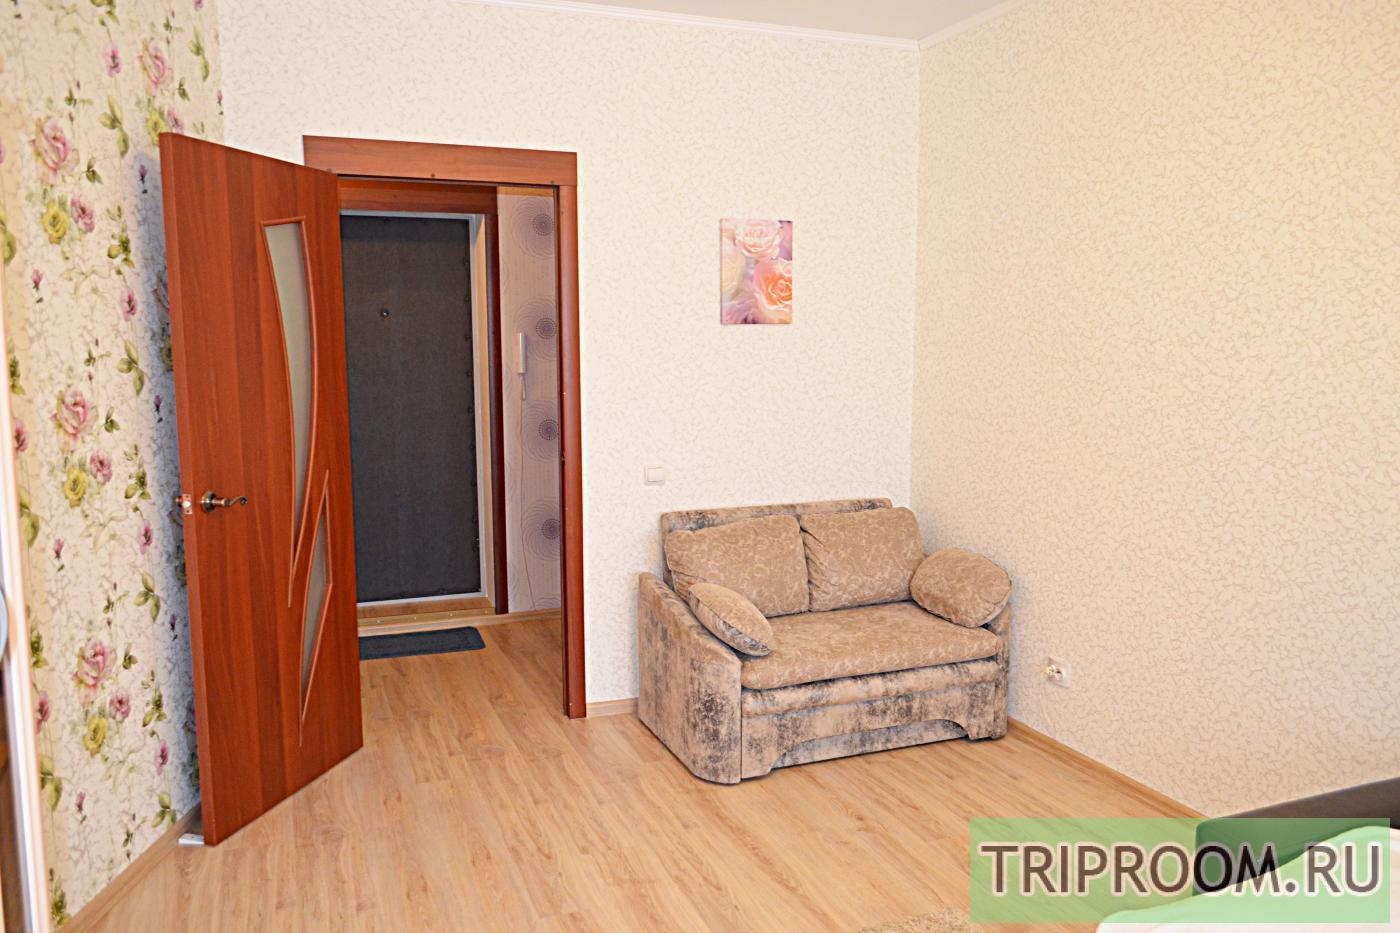 1-комнатная квартира посуточно (вариант № 15487), ул. Брылевка улица, фото № 10